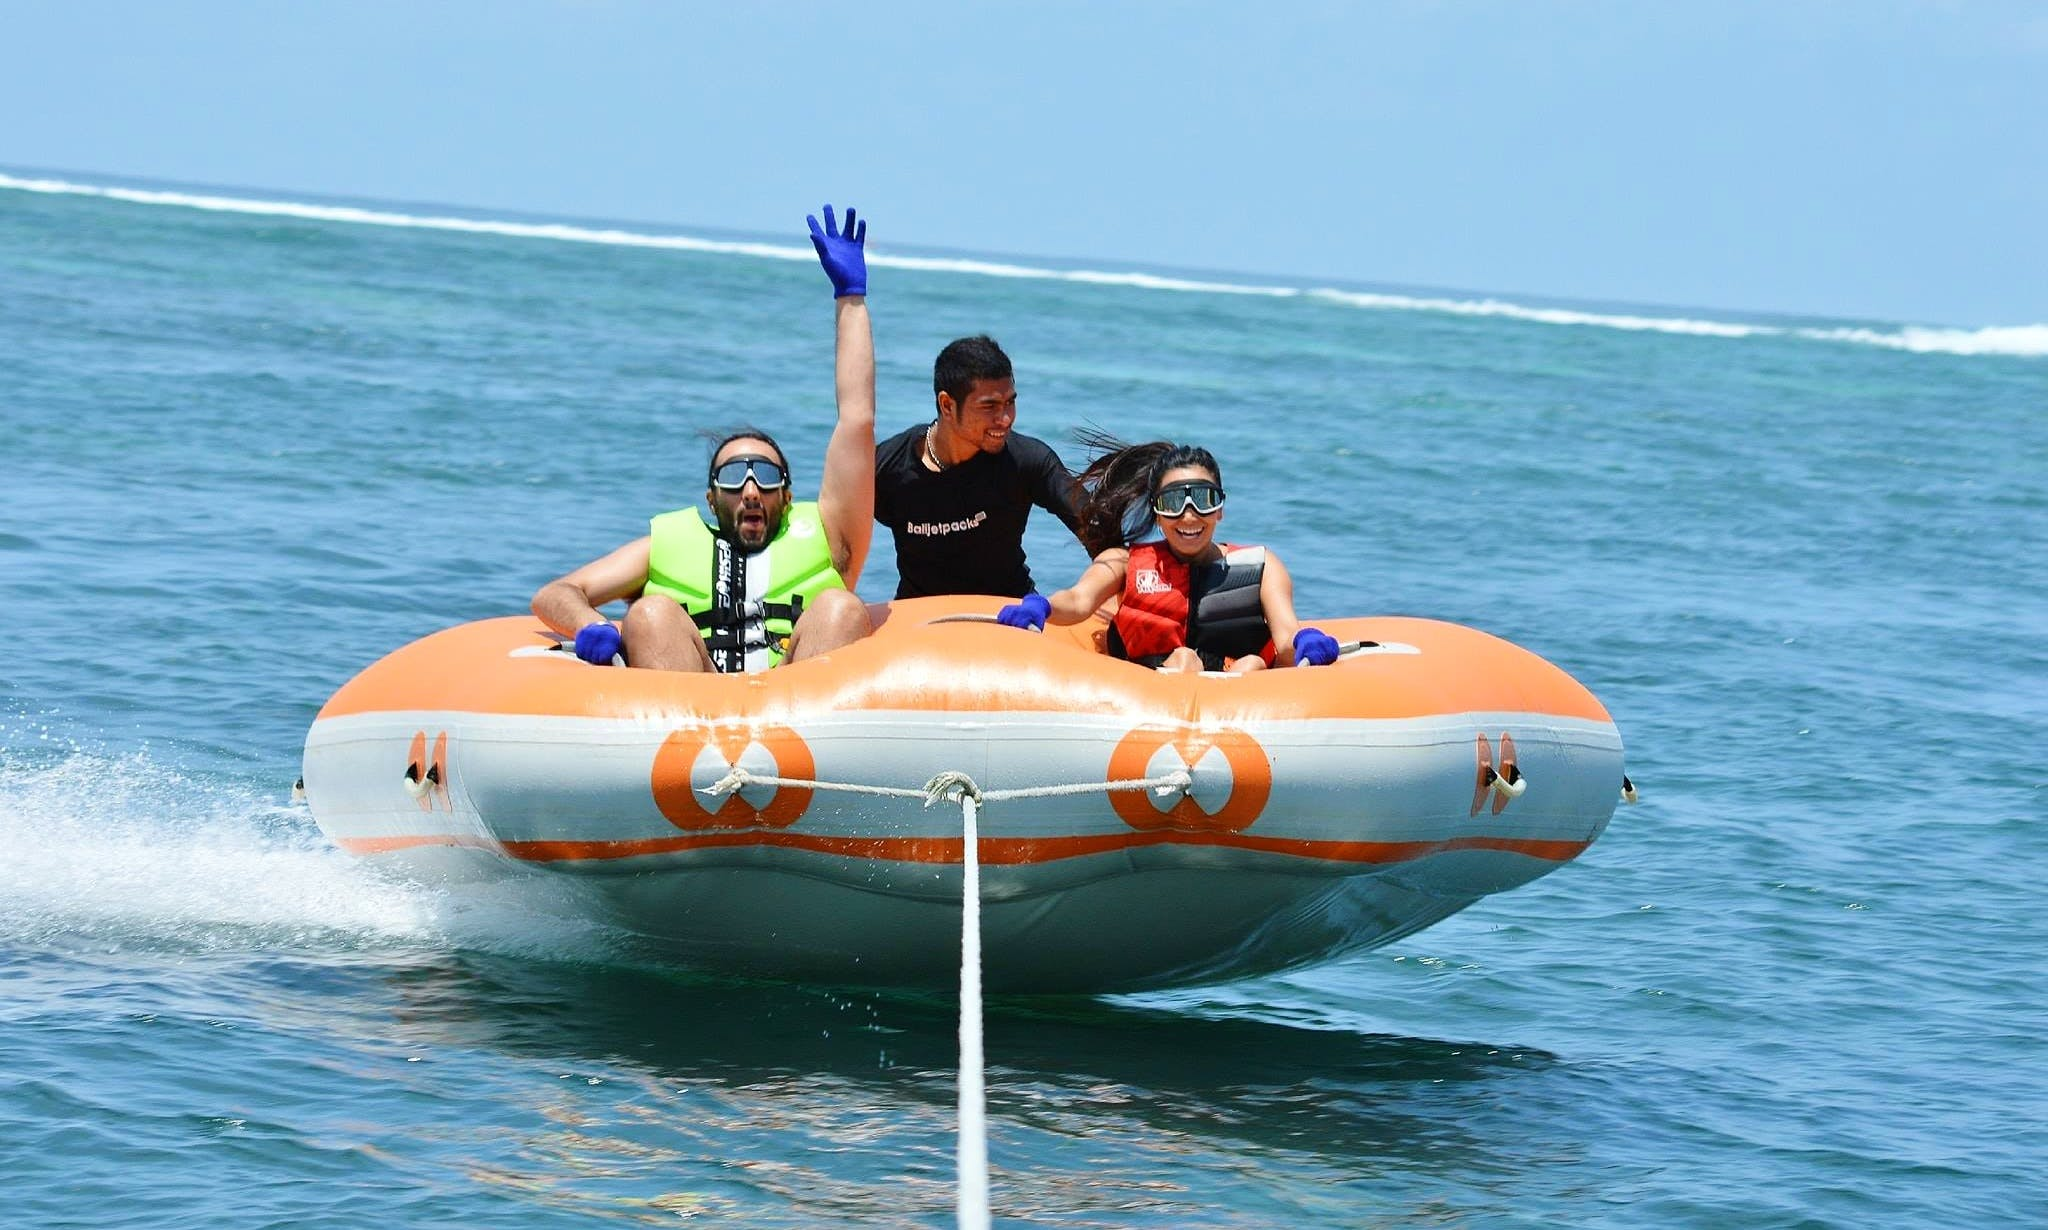 Enjoy Riding On Doughnut Boat in Kuta Selatan, Indonesia